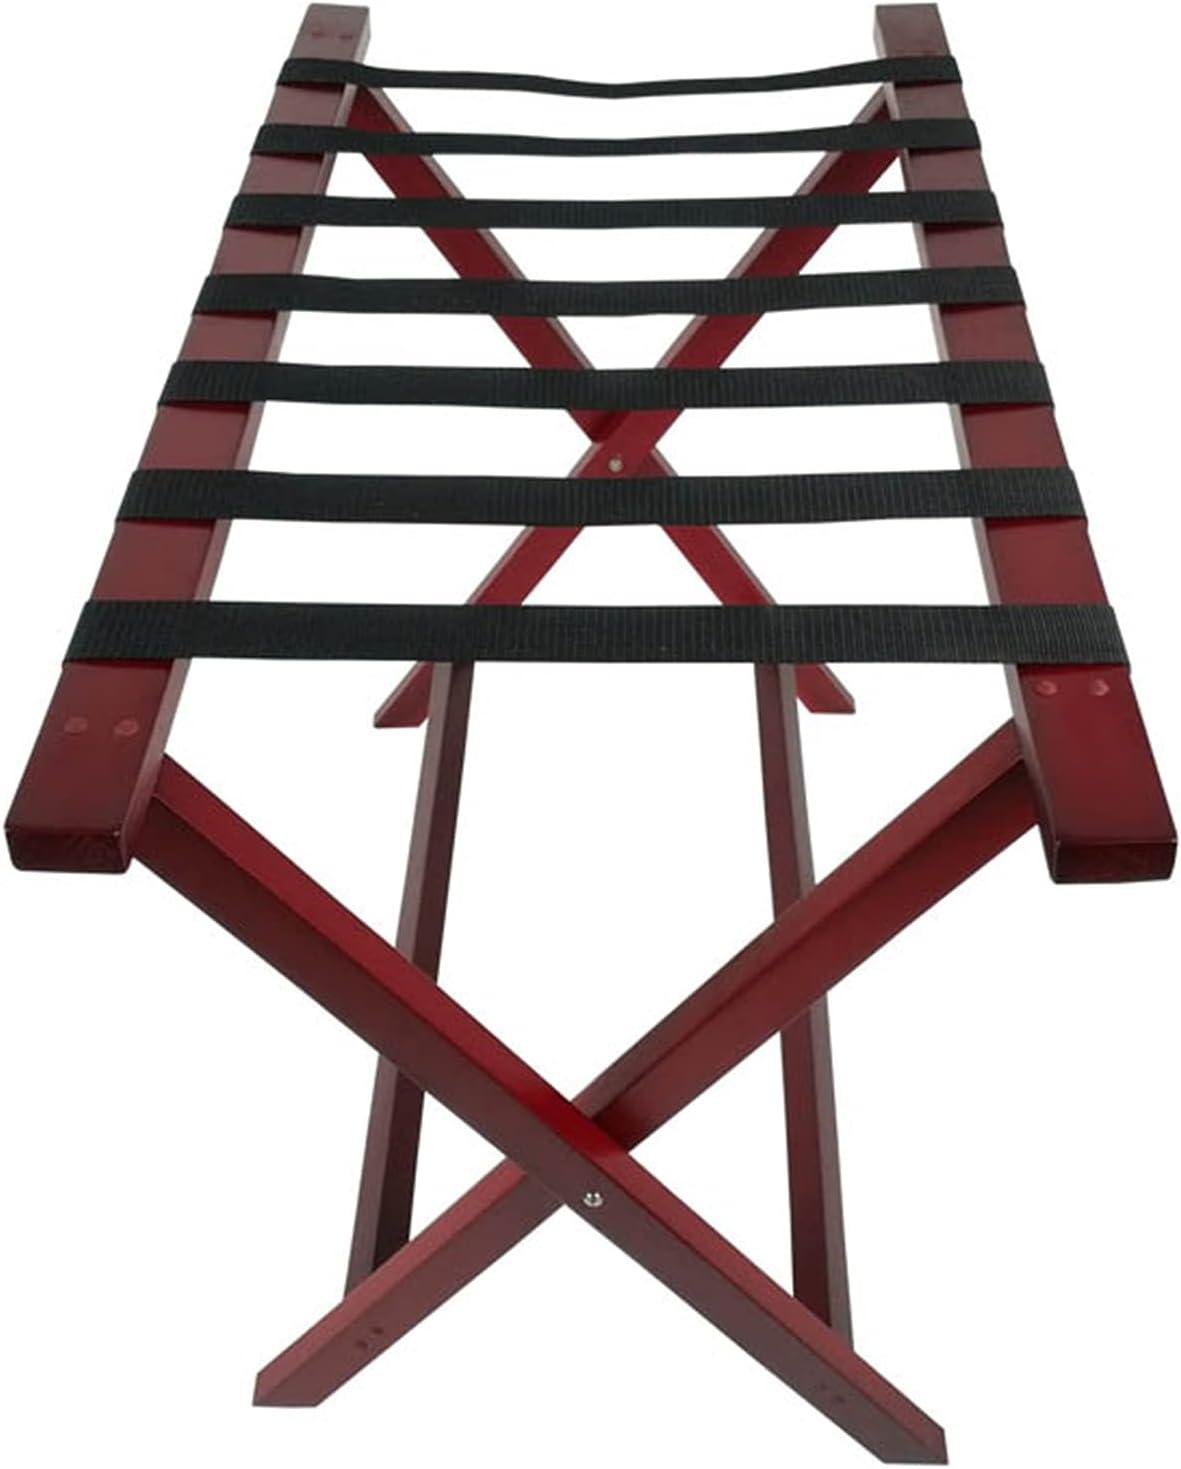 ZXFF Wooden Luggage Rack quality assurance Max 73% OFF Bracket Room Foldab Hotel